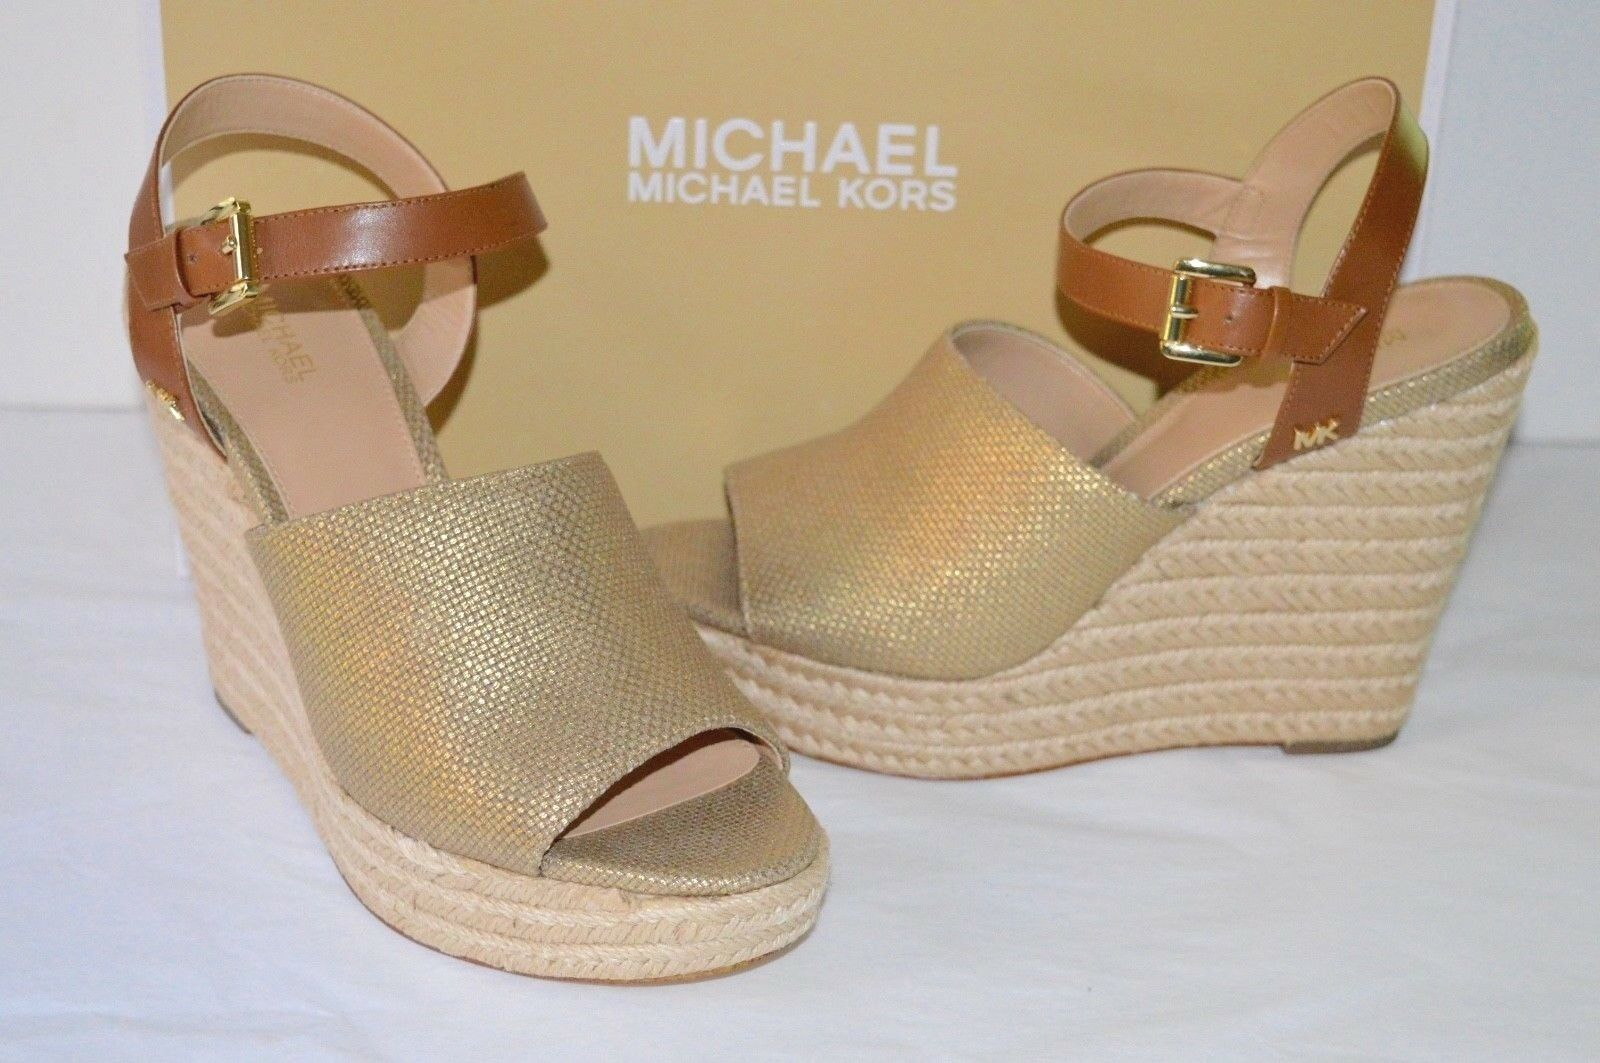 New $150 Michael Kors Penelope Wedge